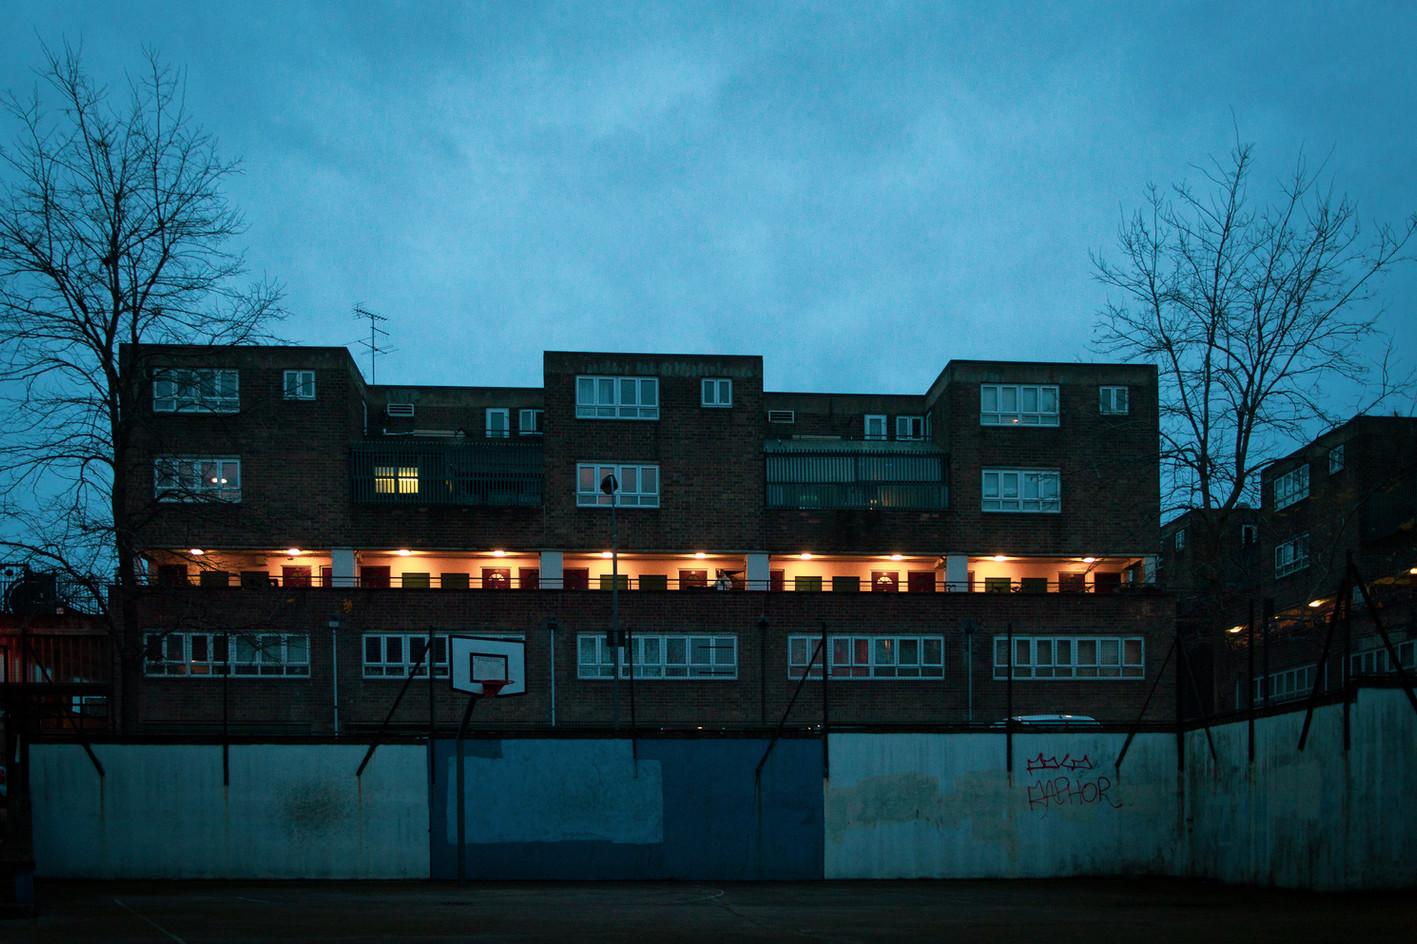 """W14 by Night"", West Kensington. (2020)"